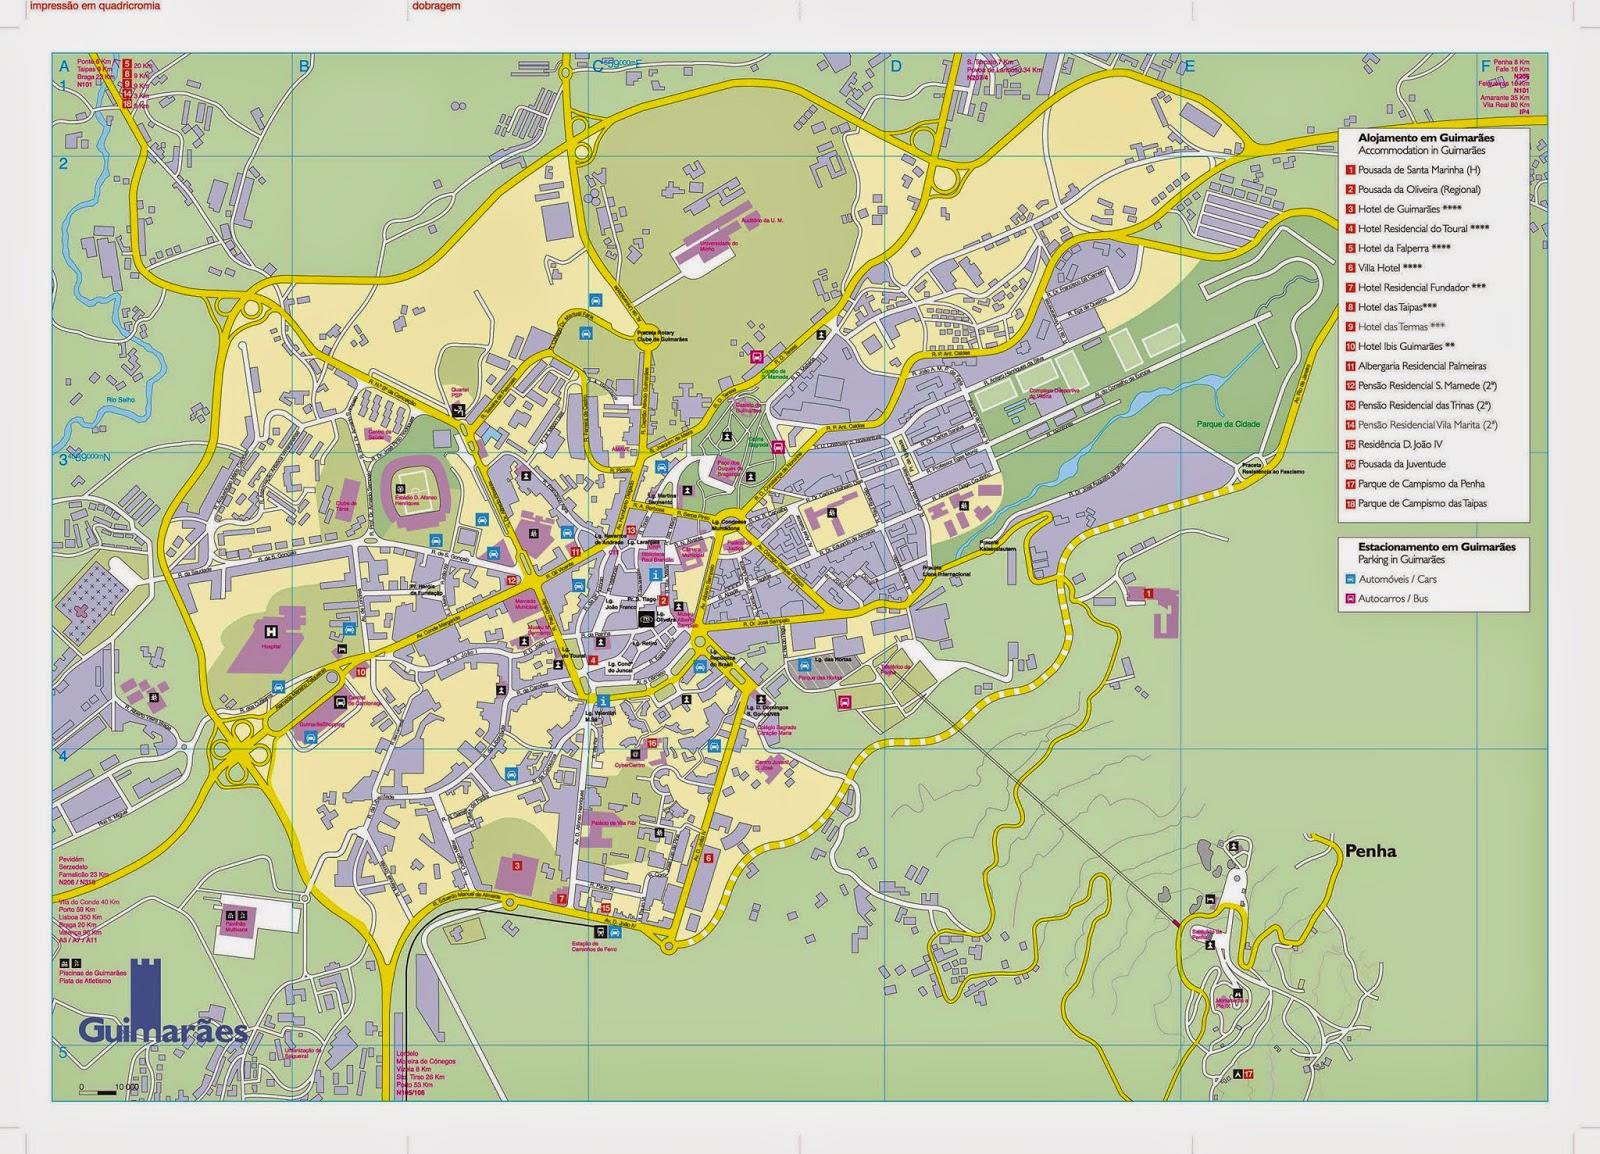 guimarães mapa Mapas de Guimarães   Portugal | MapasBlog guimarães mapa